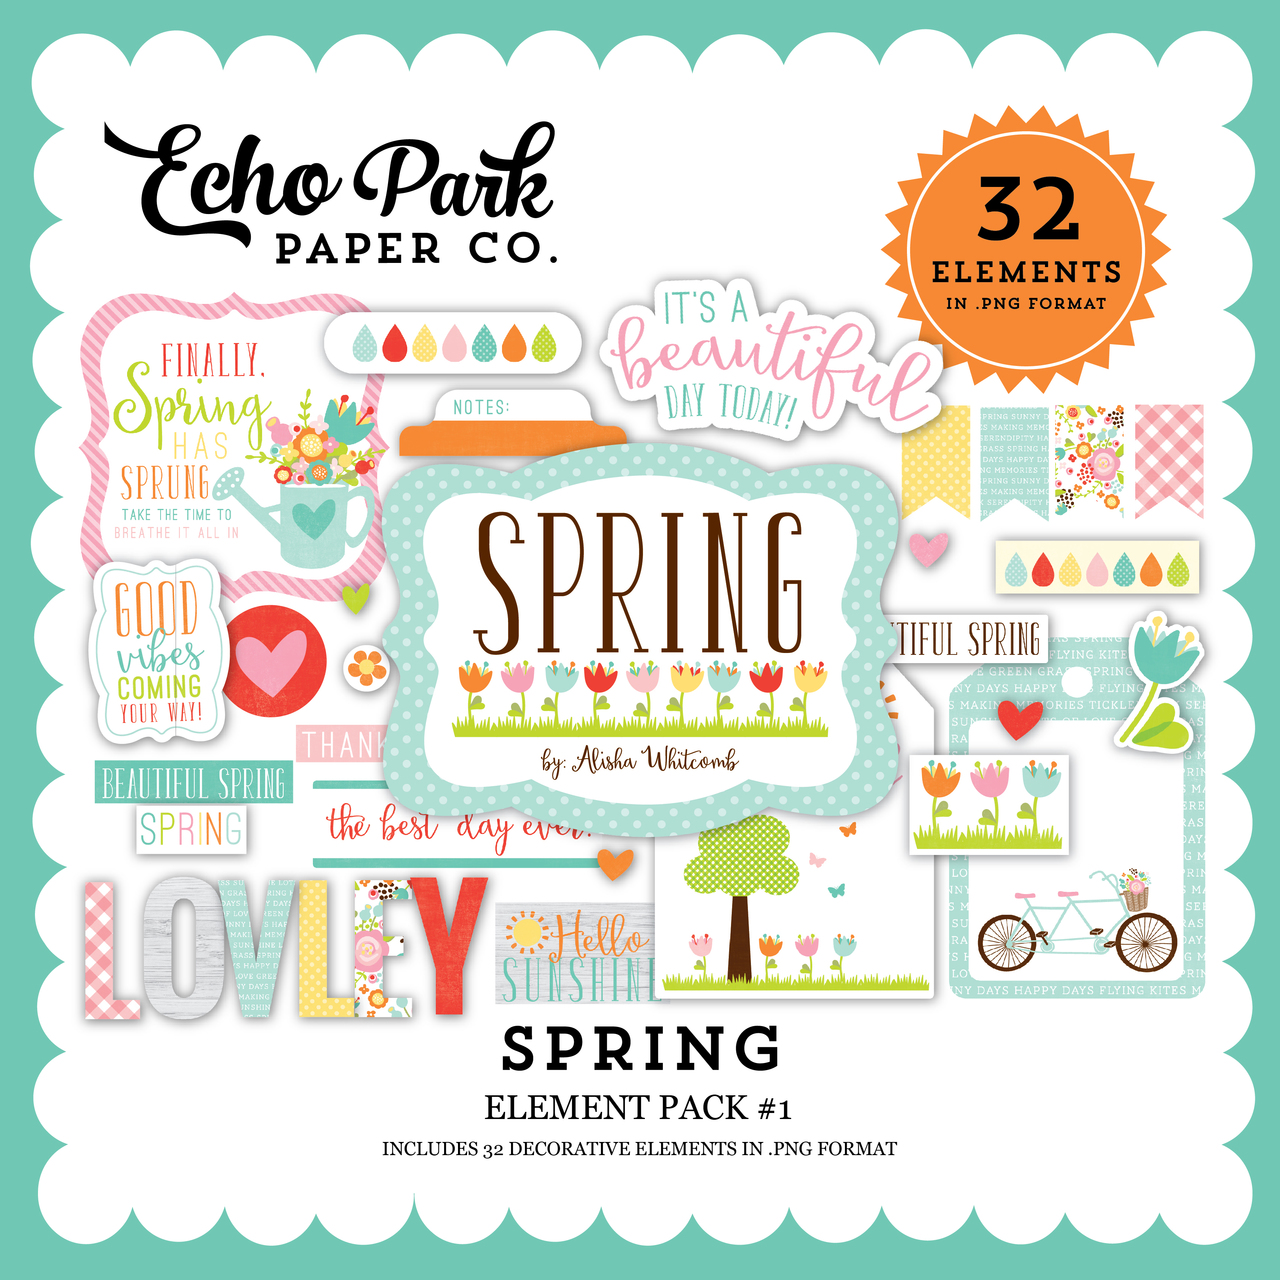 Spring Elements Pack #1